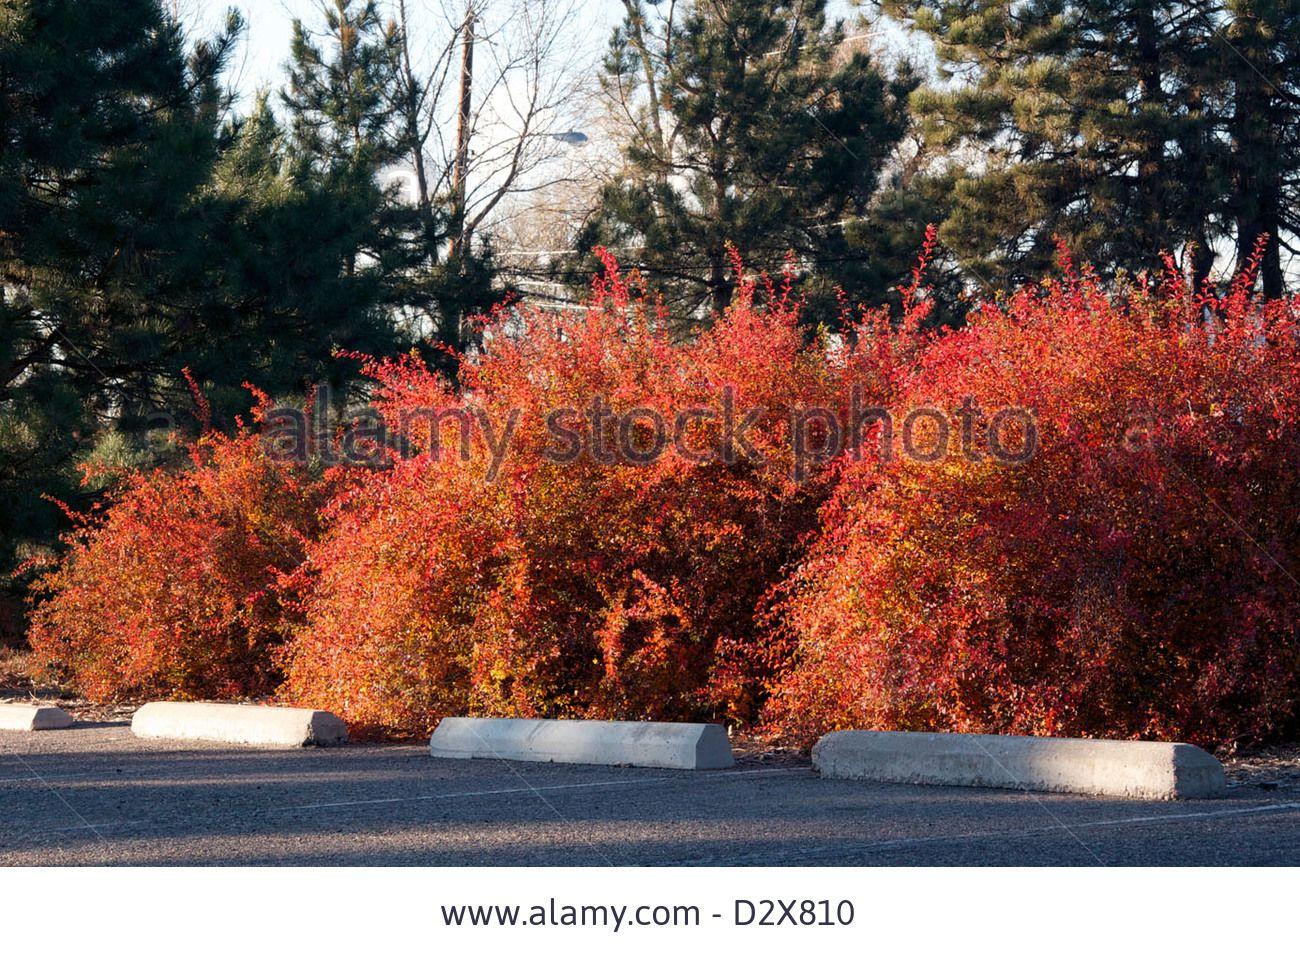 Vanhoutte Spirea in fall leaf color Stock Photo | Garden Flowering ...